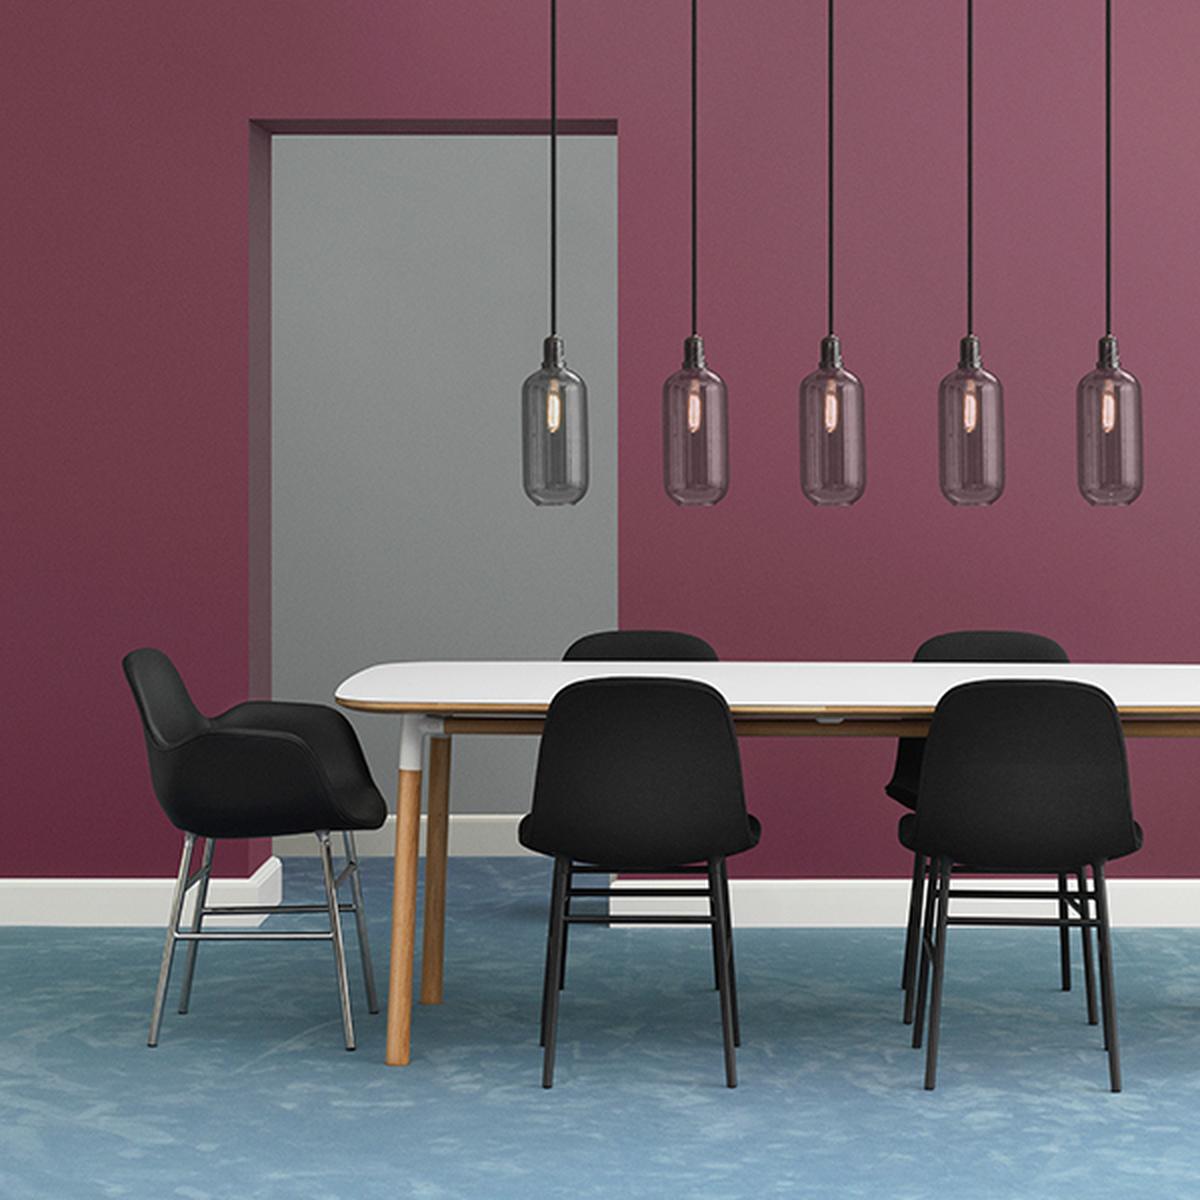 Normann copenhagen tavolo form 200 x 95 cm bianco rovere for Normann copenhagen shop